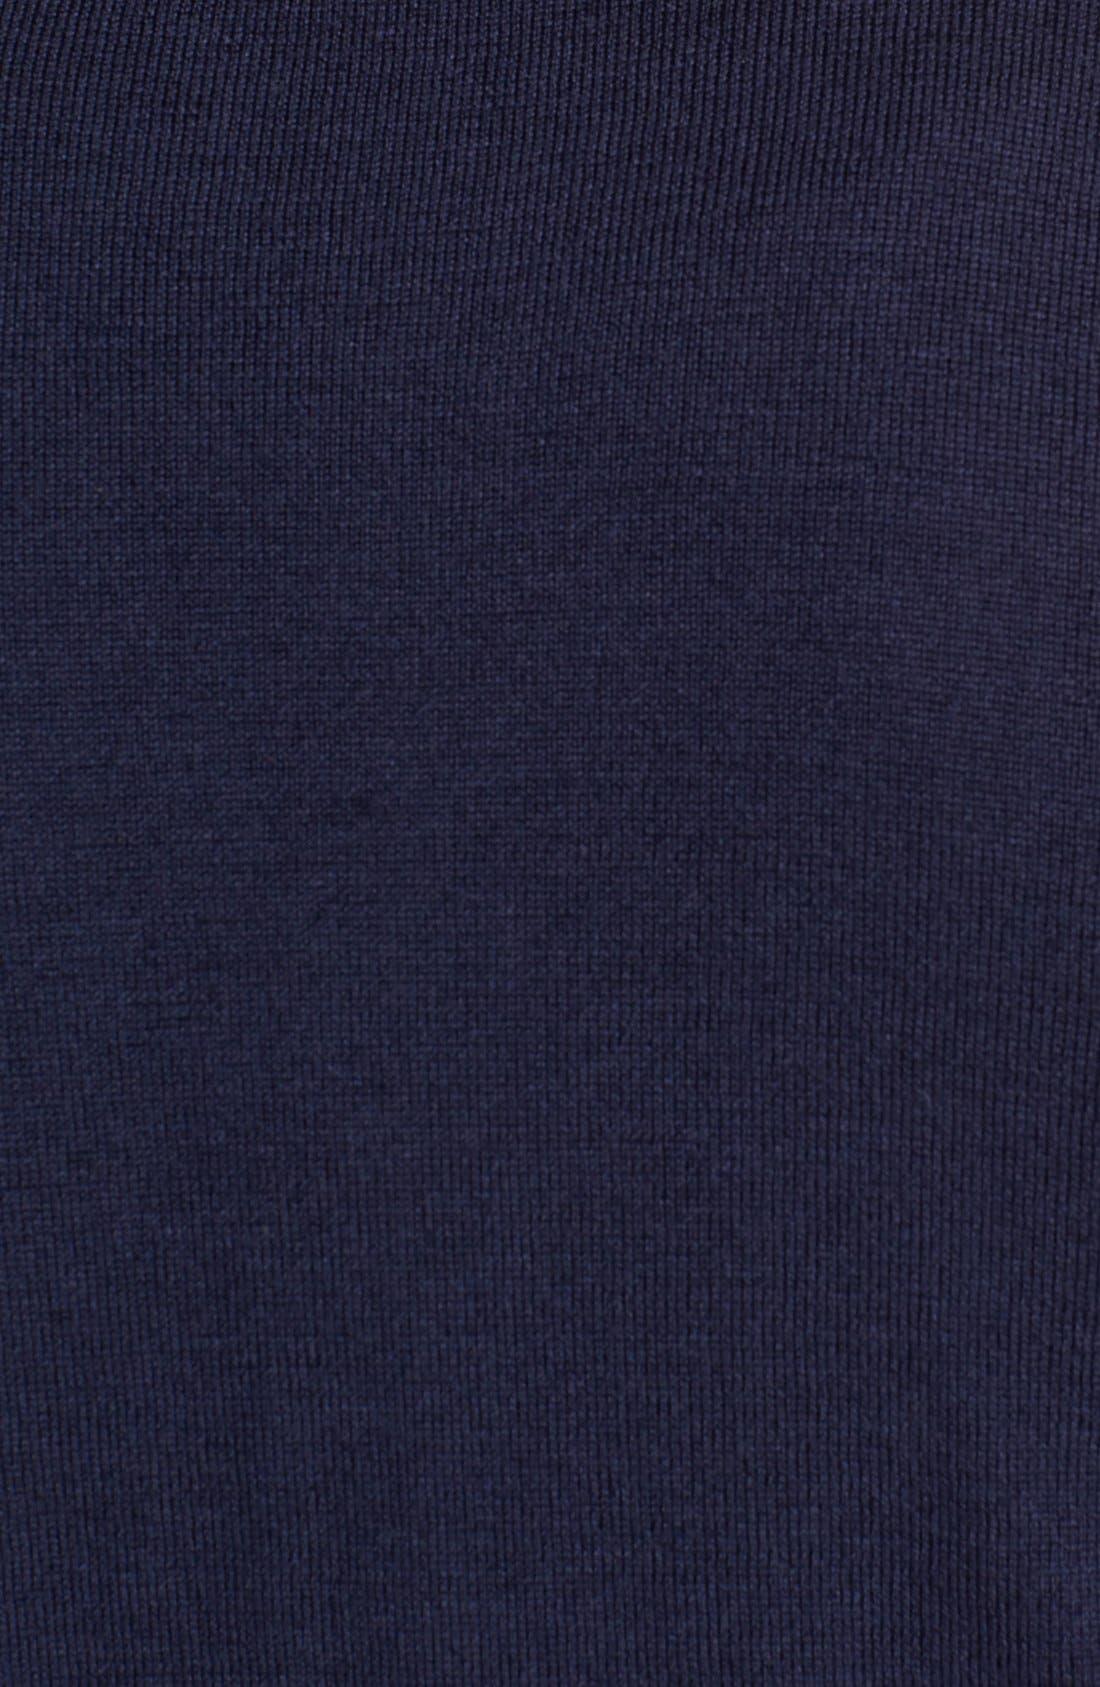 Alternate Image 3  - Jack Spade 'Brockman' Merino Wool Cardigan